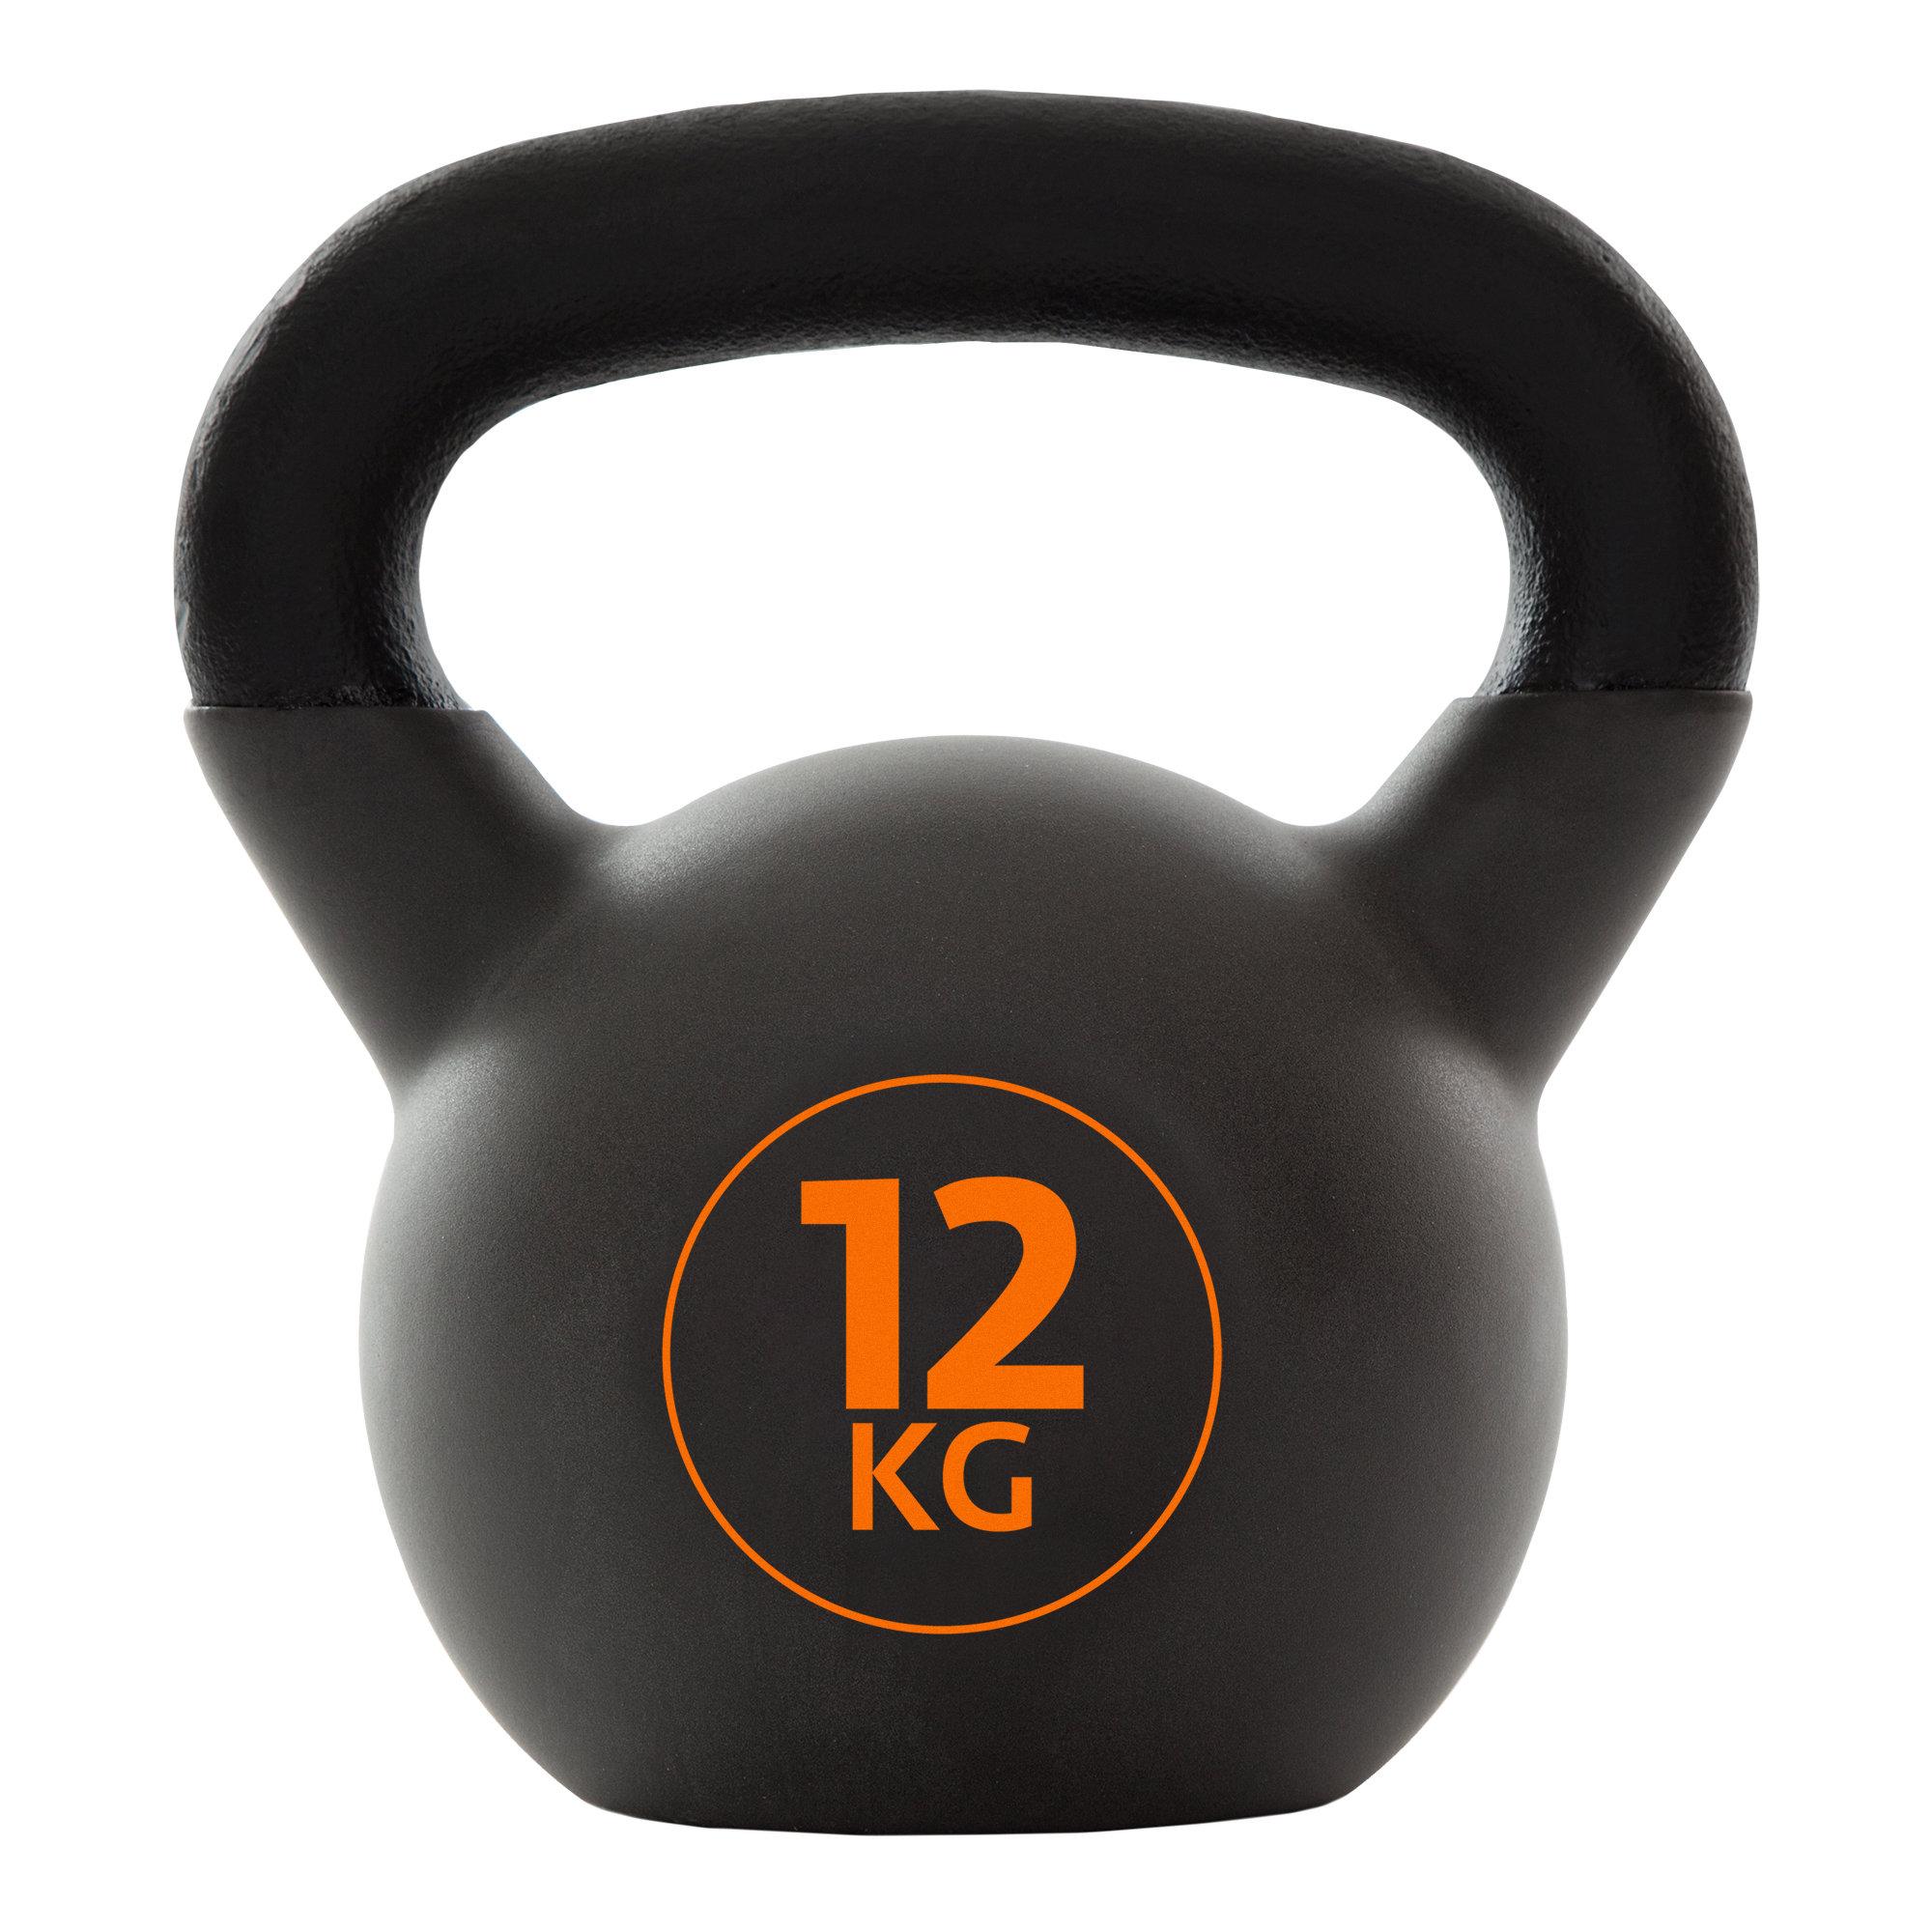 Torneo Гиря, 12 кг 1026-120